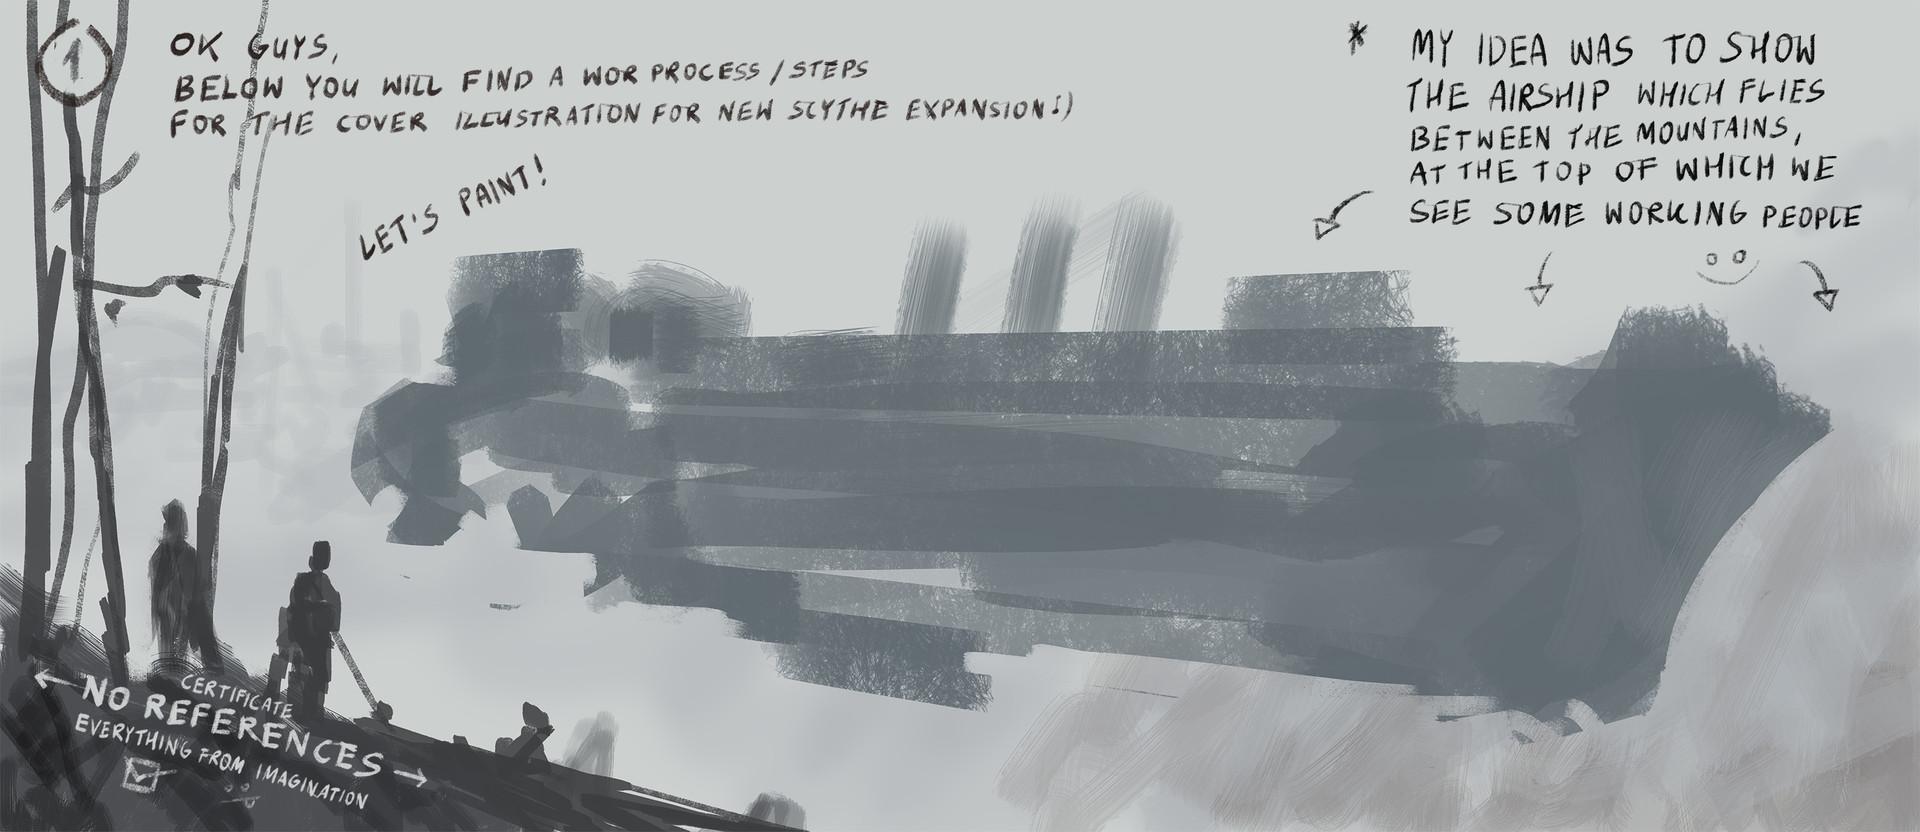 Jakub rozalski airship expansion cover art process0